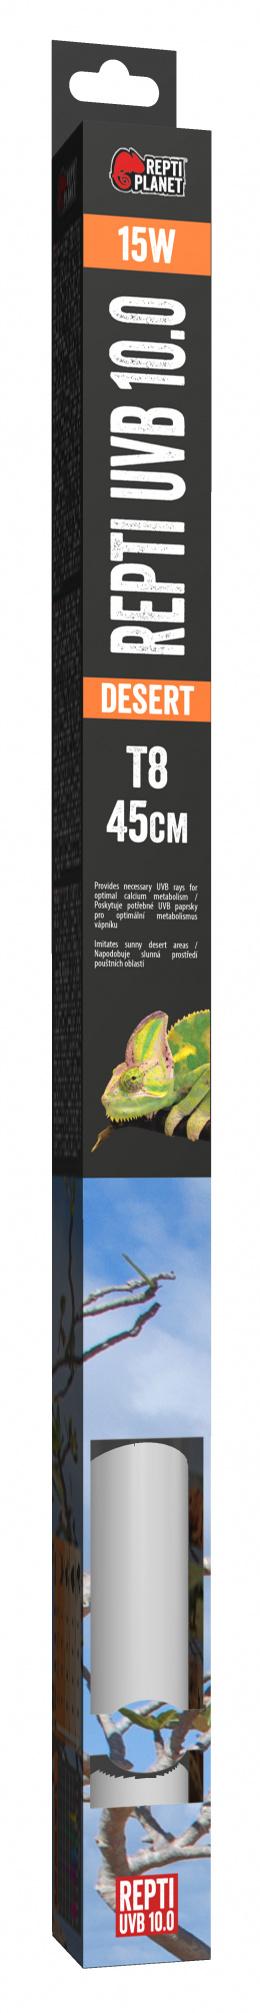 Лампа для террариумов - ReptiPlanet Repti T8 UVB 10.0 15W, 45 см